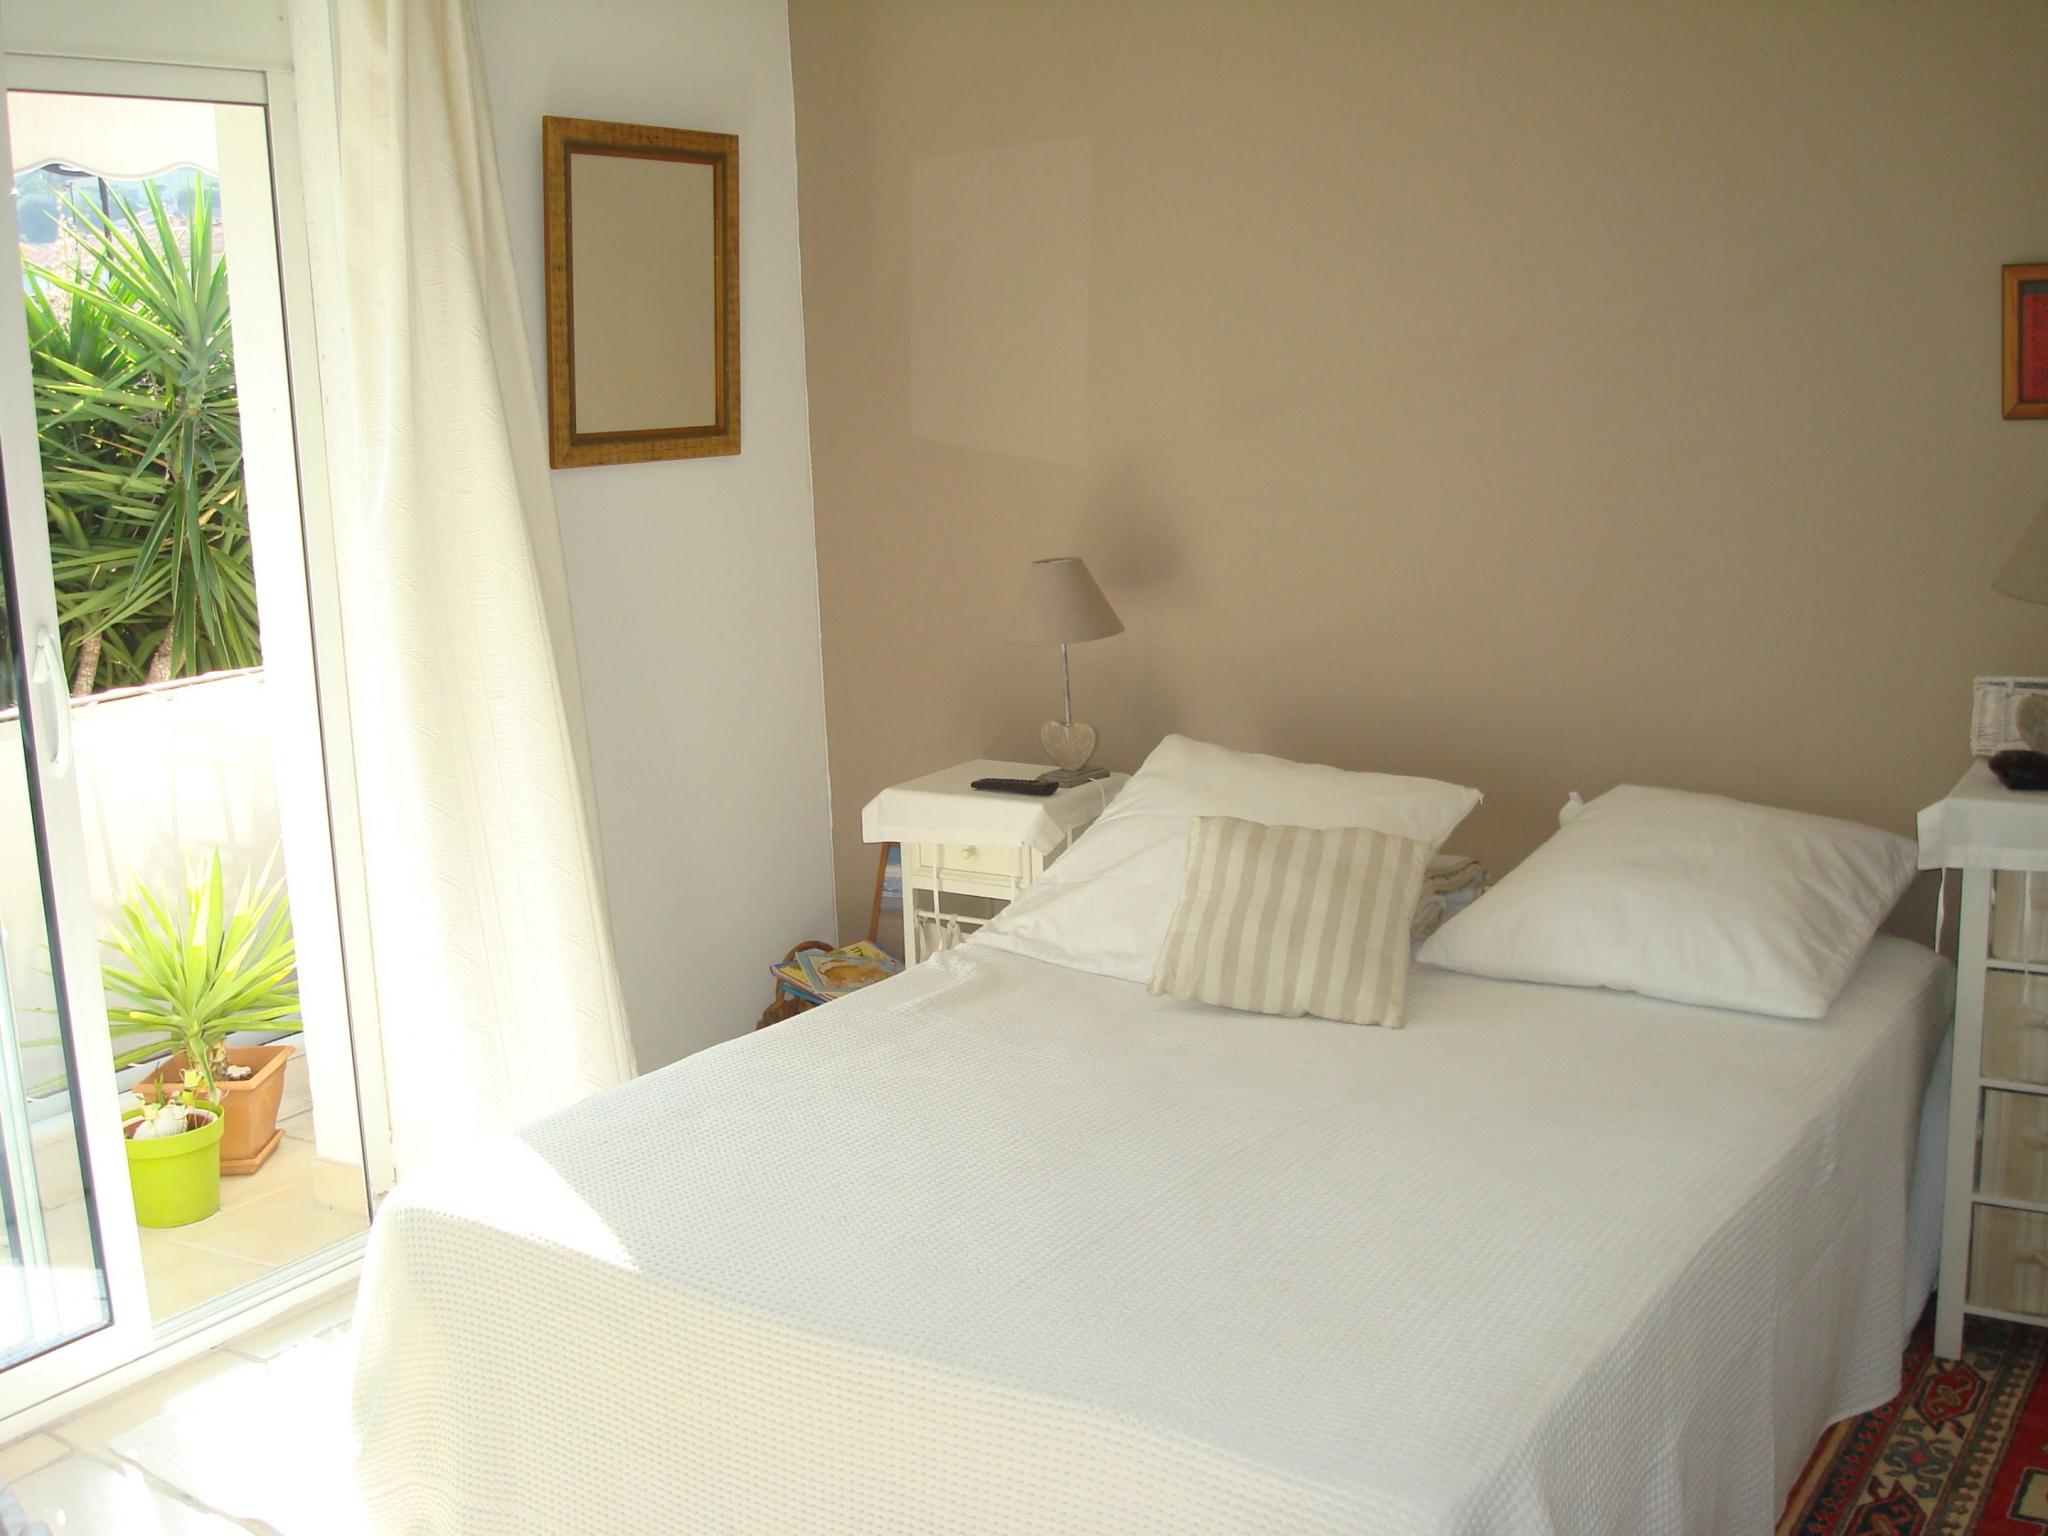 Image_9, Maison / villa, Ollioules, ref :050119